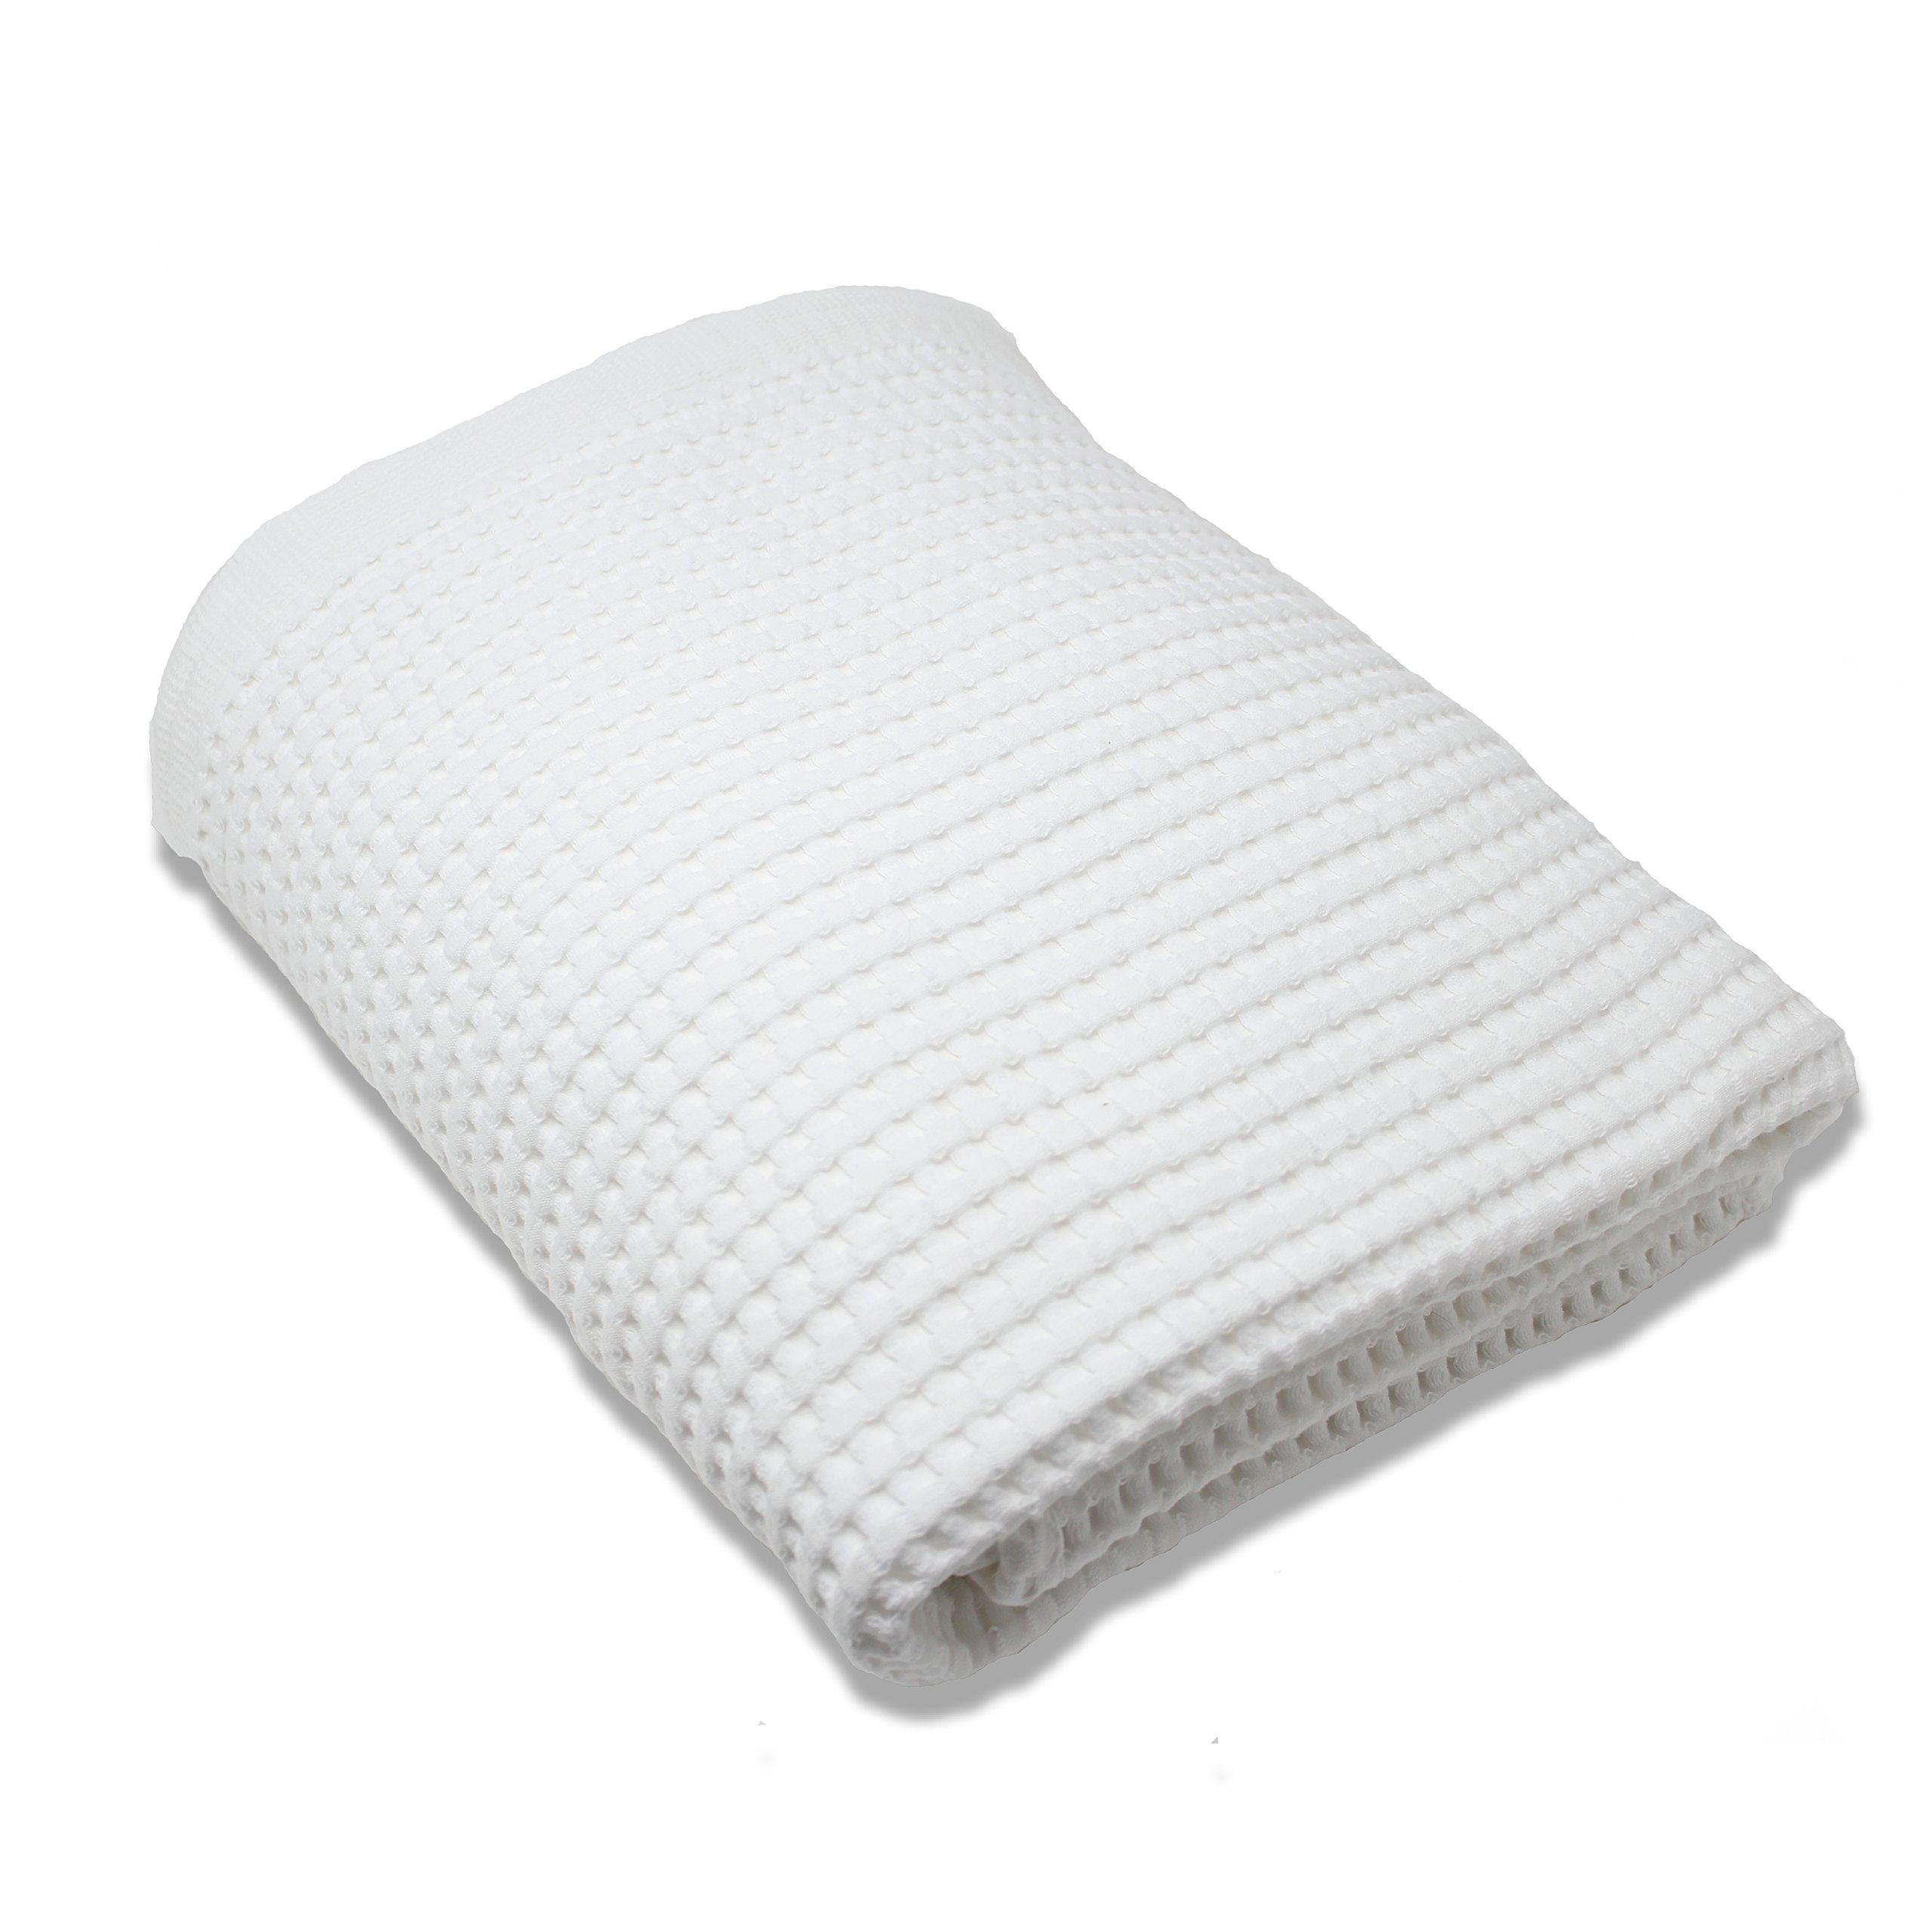 Gilden Tree 100% Natural Cotton Lattice Waffle Weave Bath Towel (White)